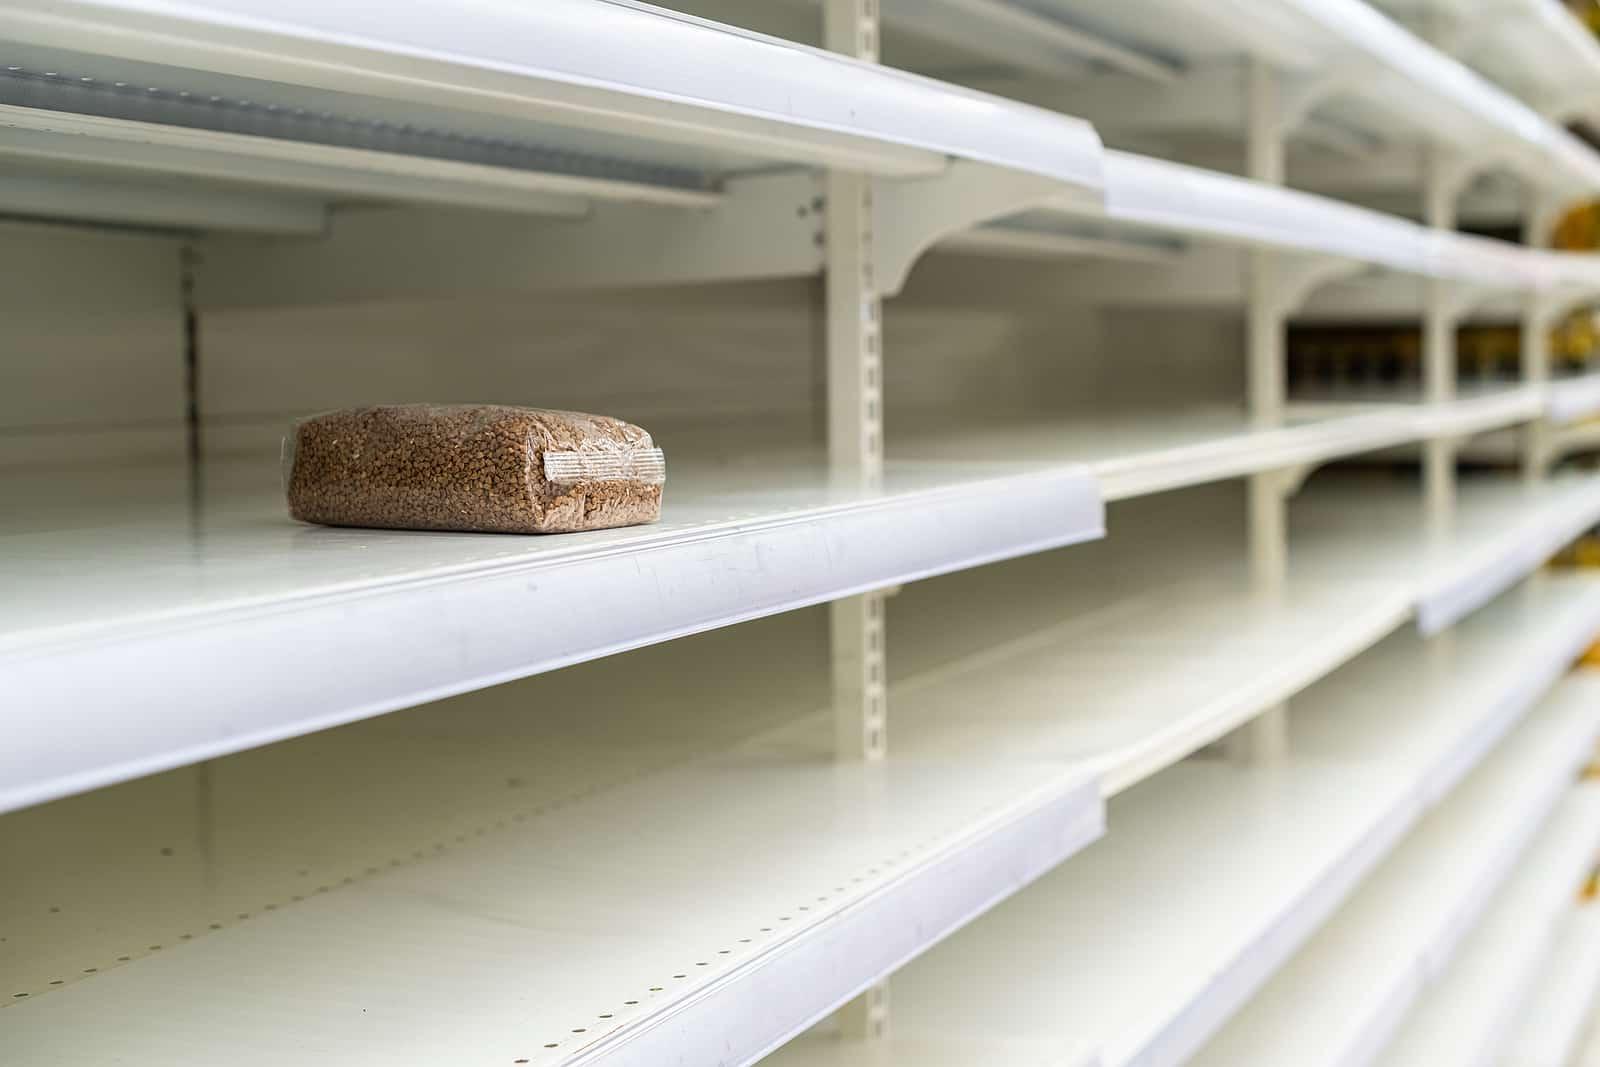 empty grocery